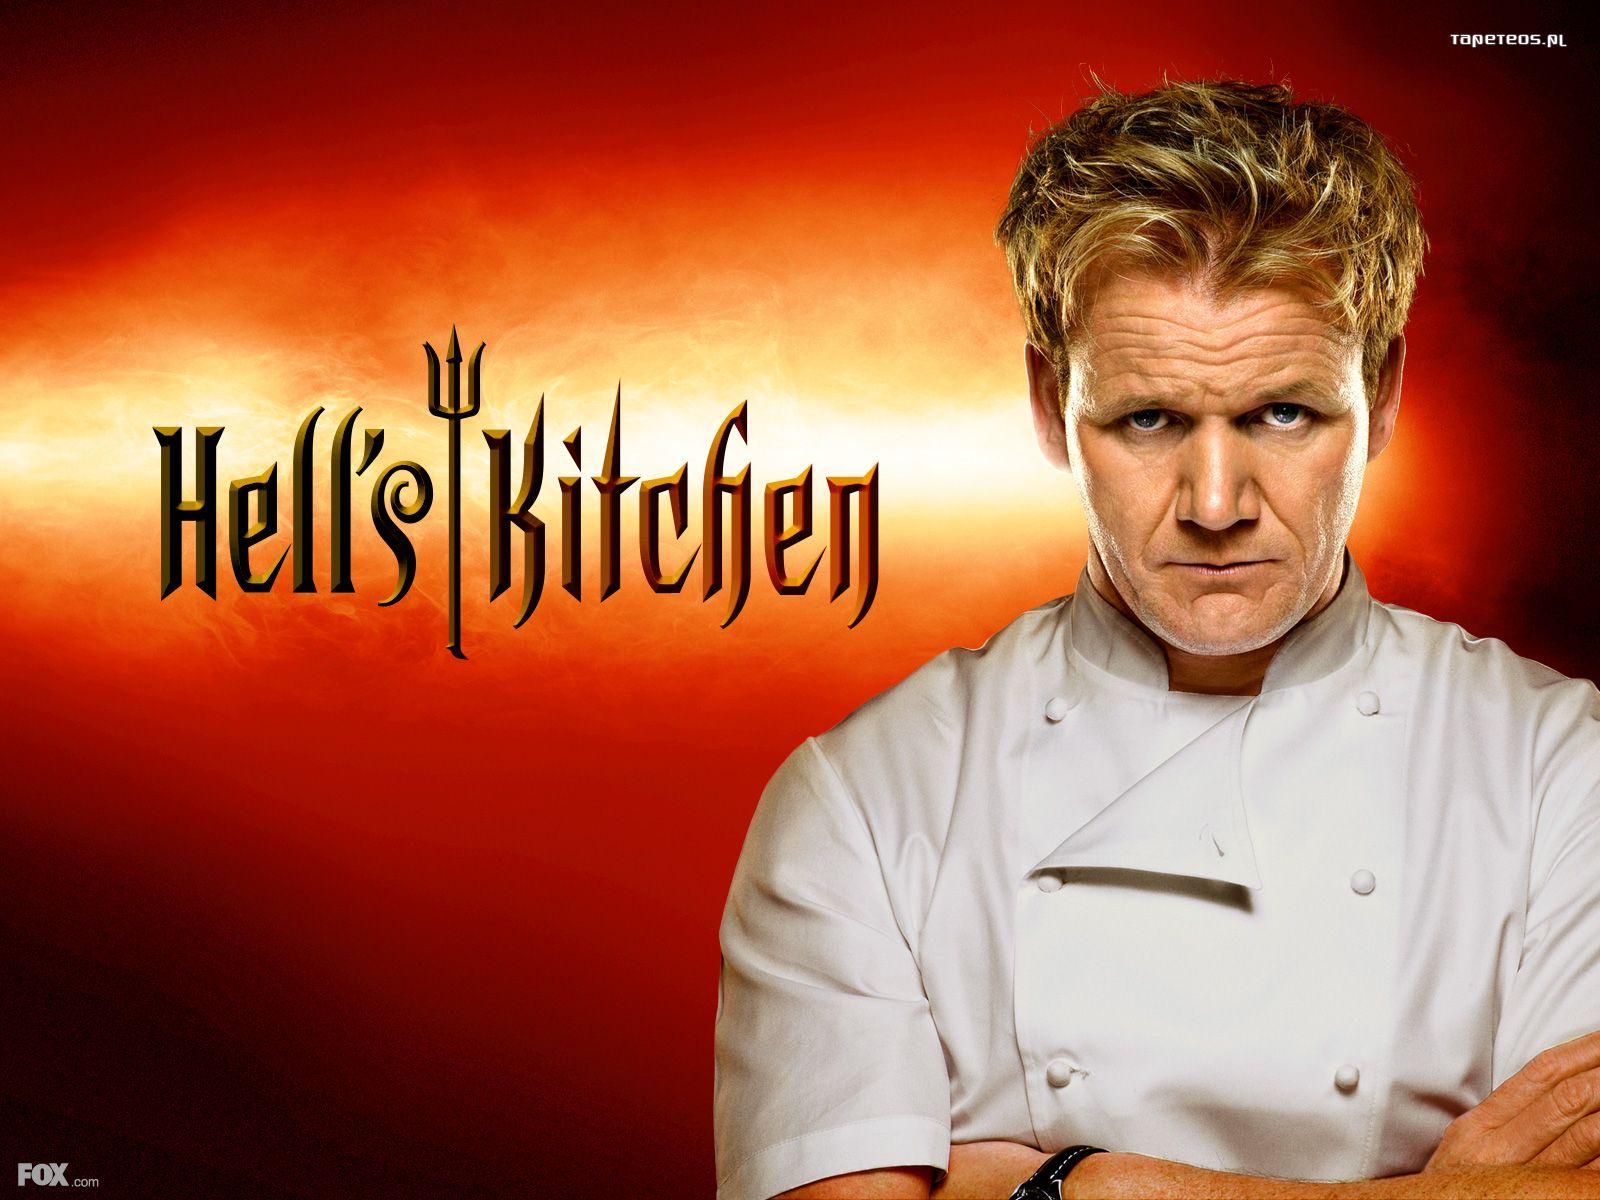 Hells Kitchen Piekielna Kuchnia Gordona Ramsaya 001